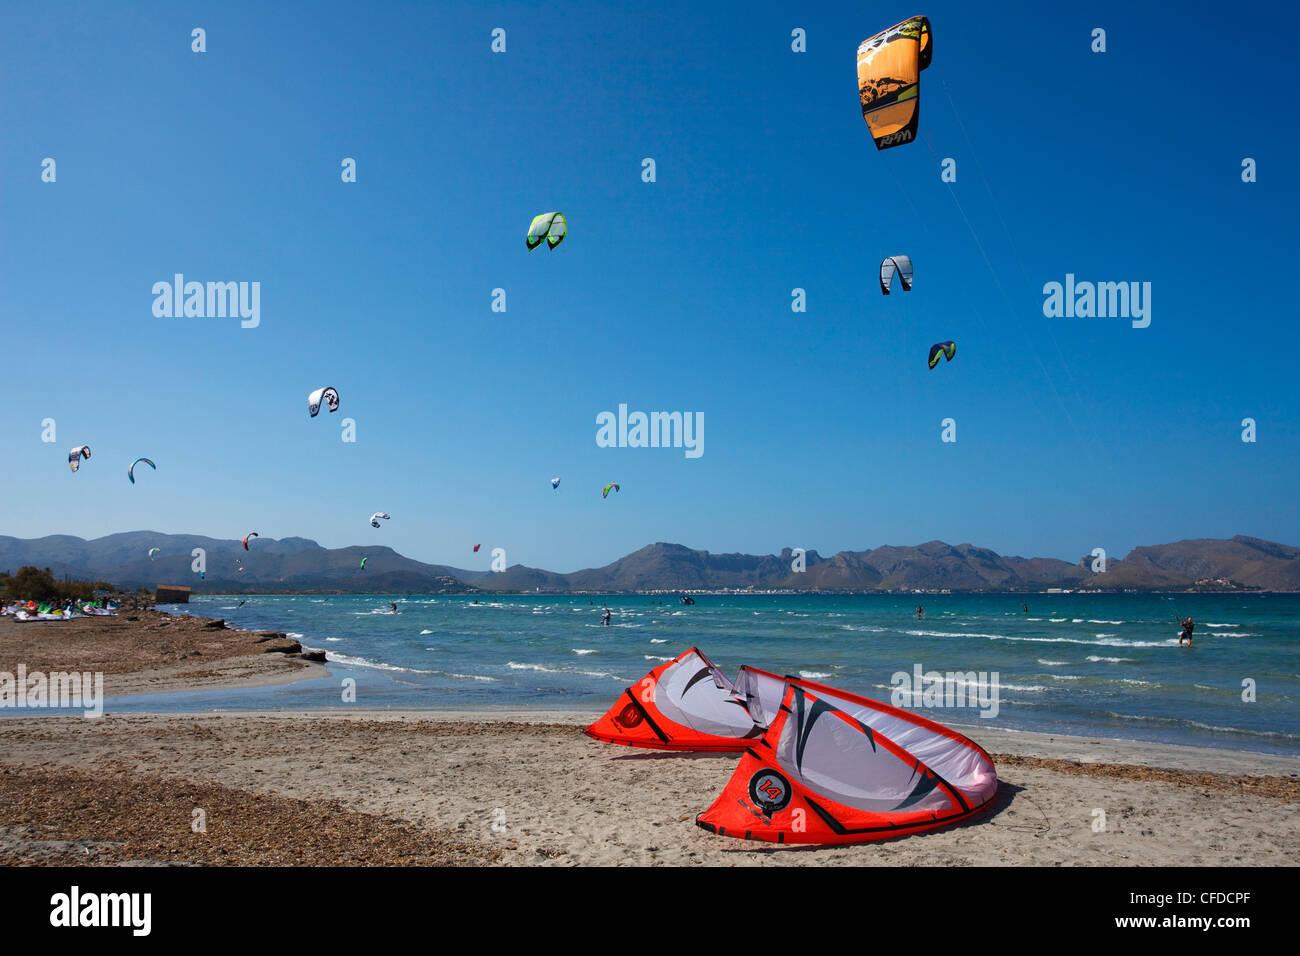 Kitesurfing, Badia de Pollenca, bay of Pollenca, beach, Mallorca, Balearic Islands, Spain, Europe - Stock Image